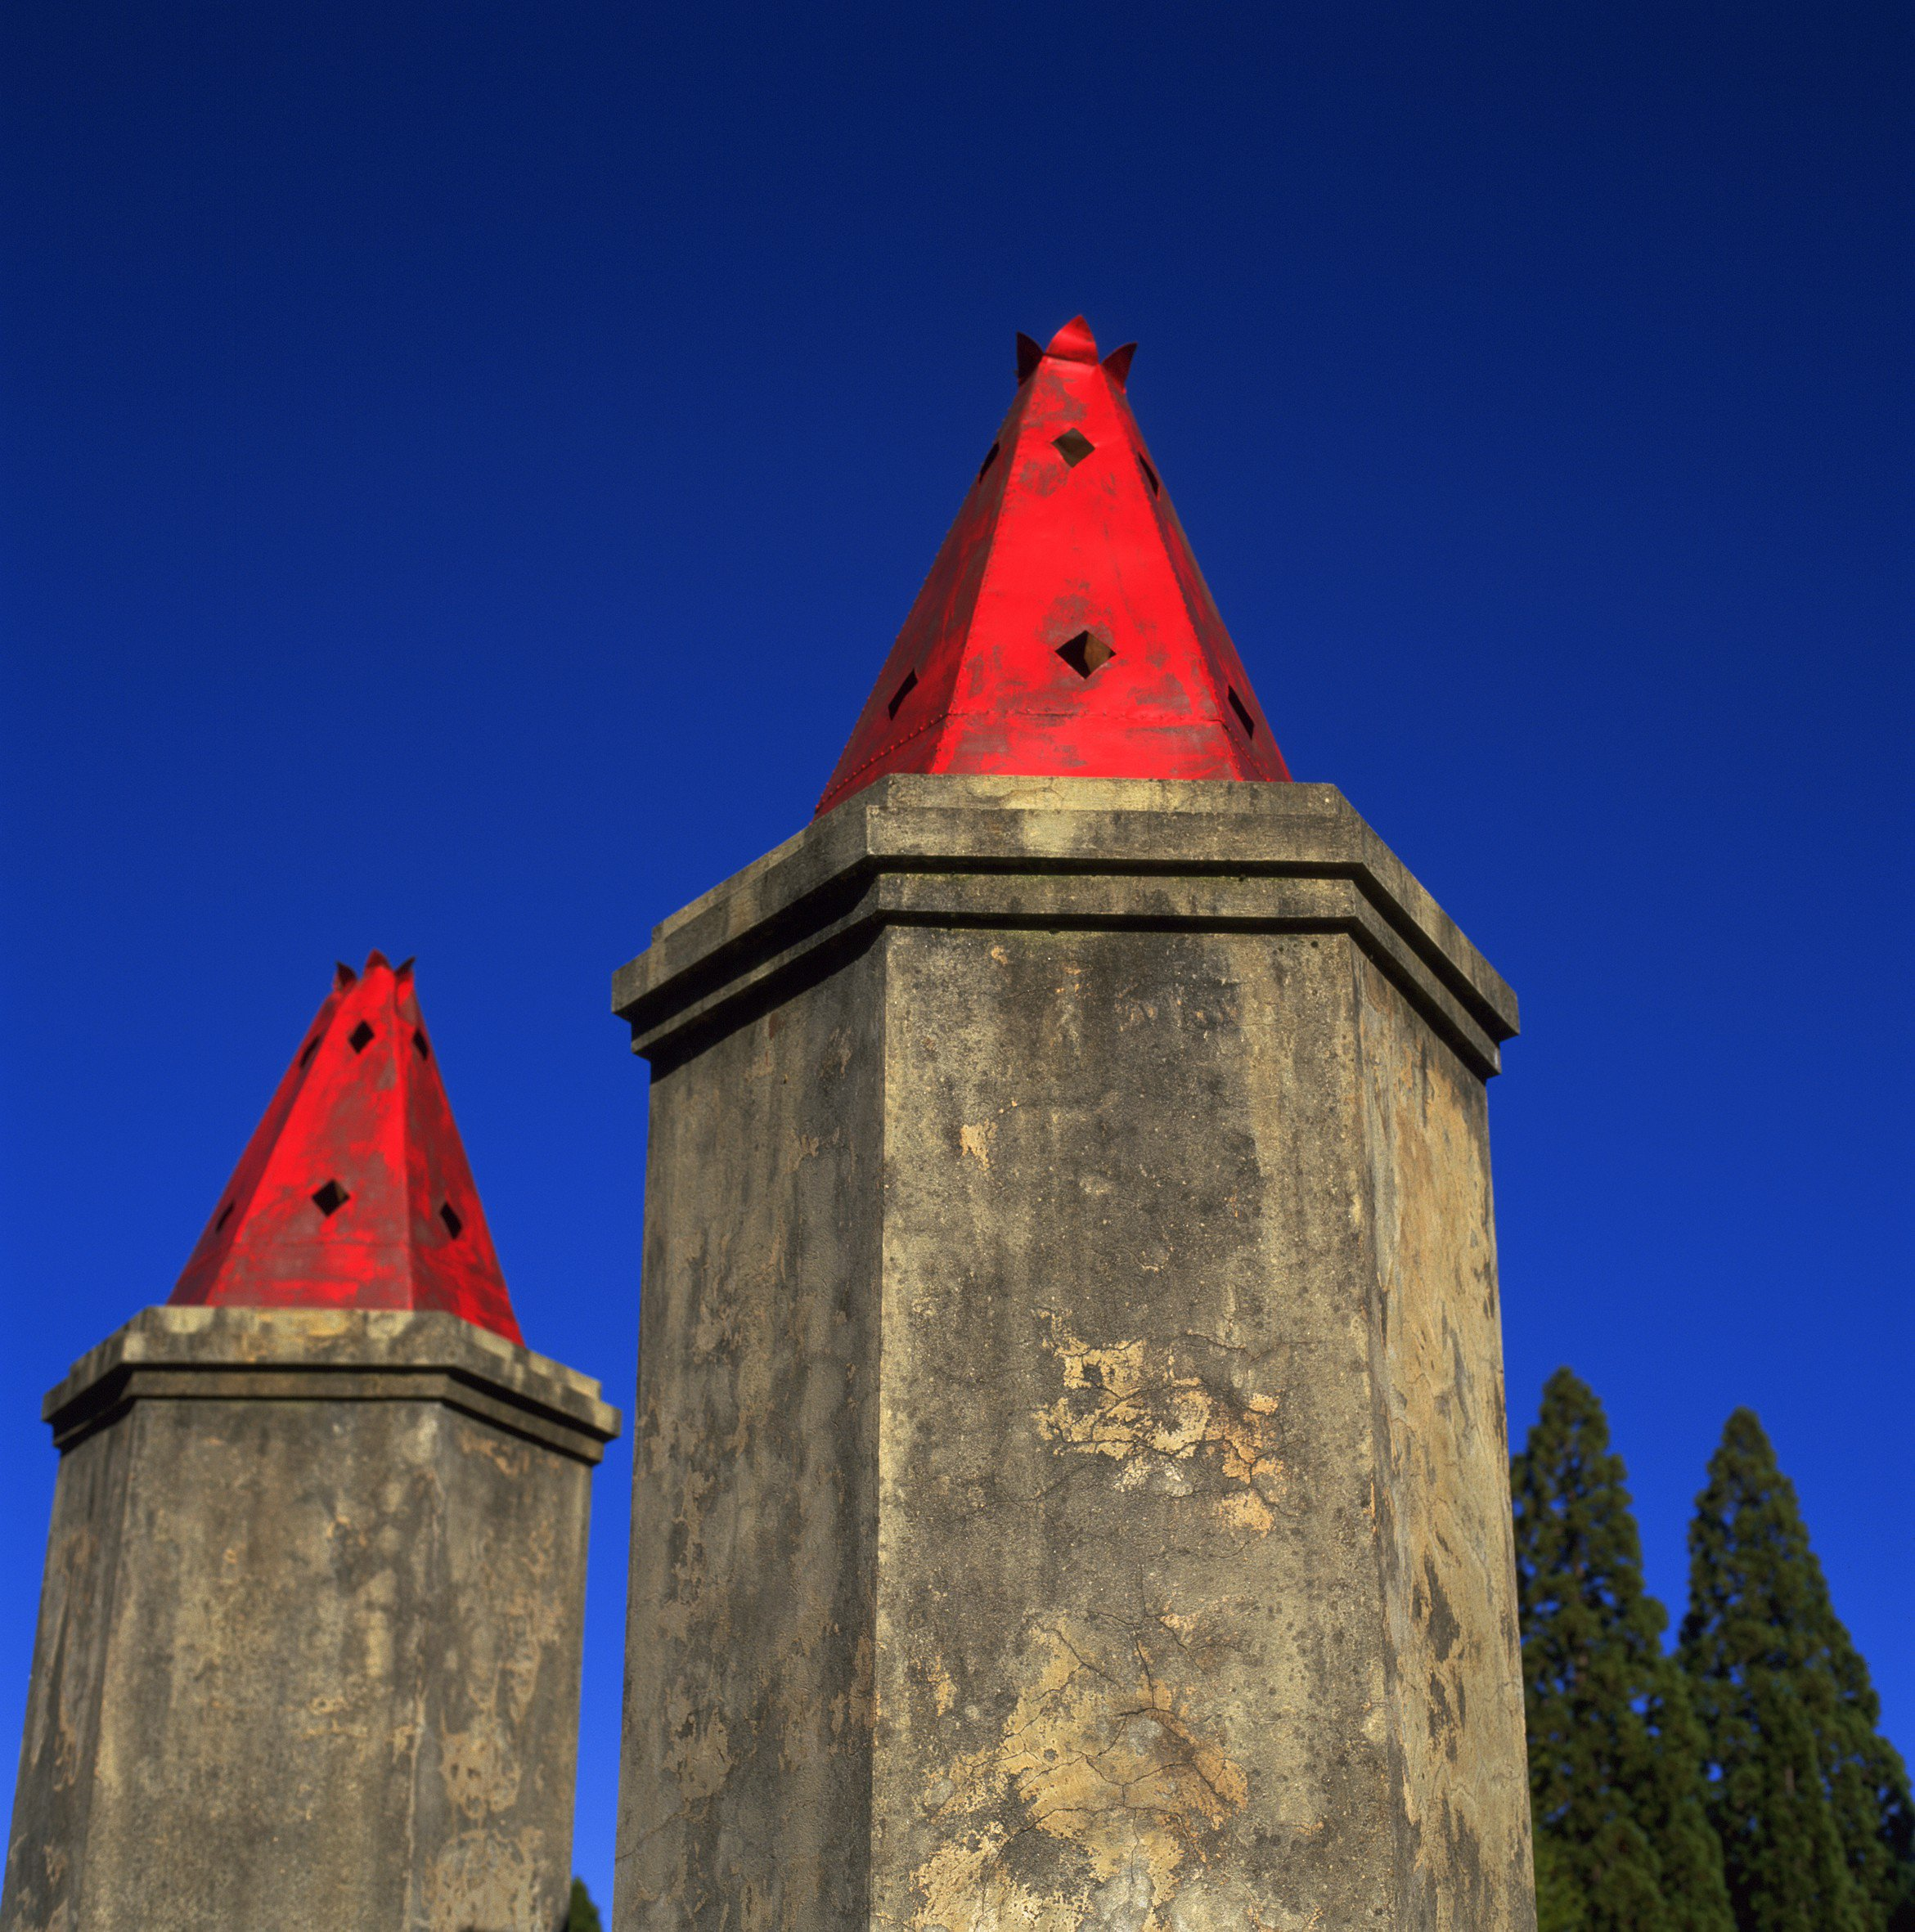 Chinese burning towers